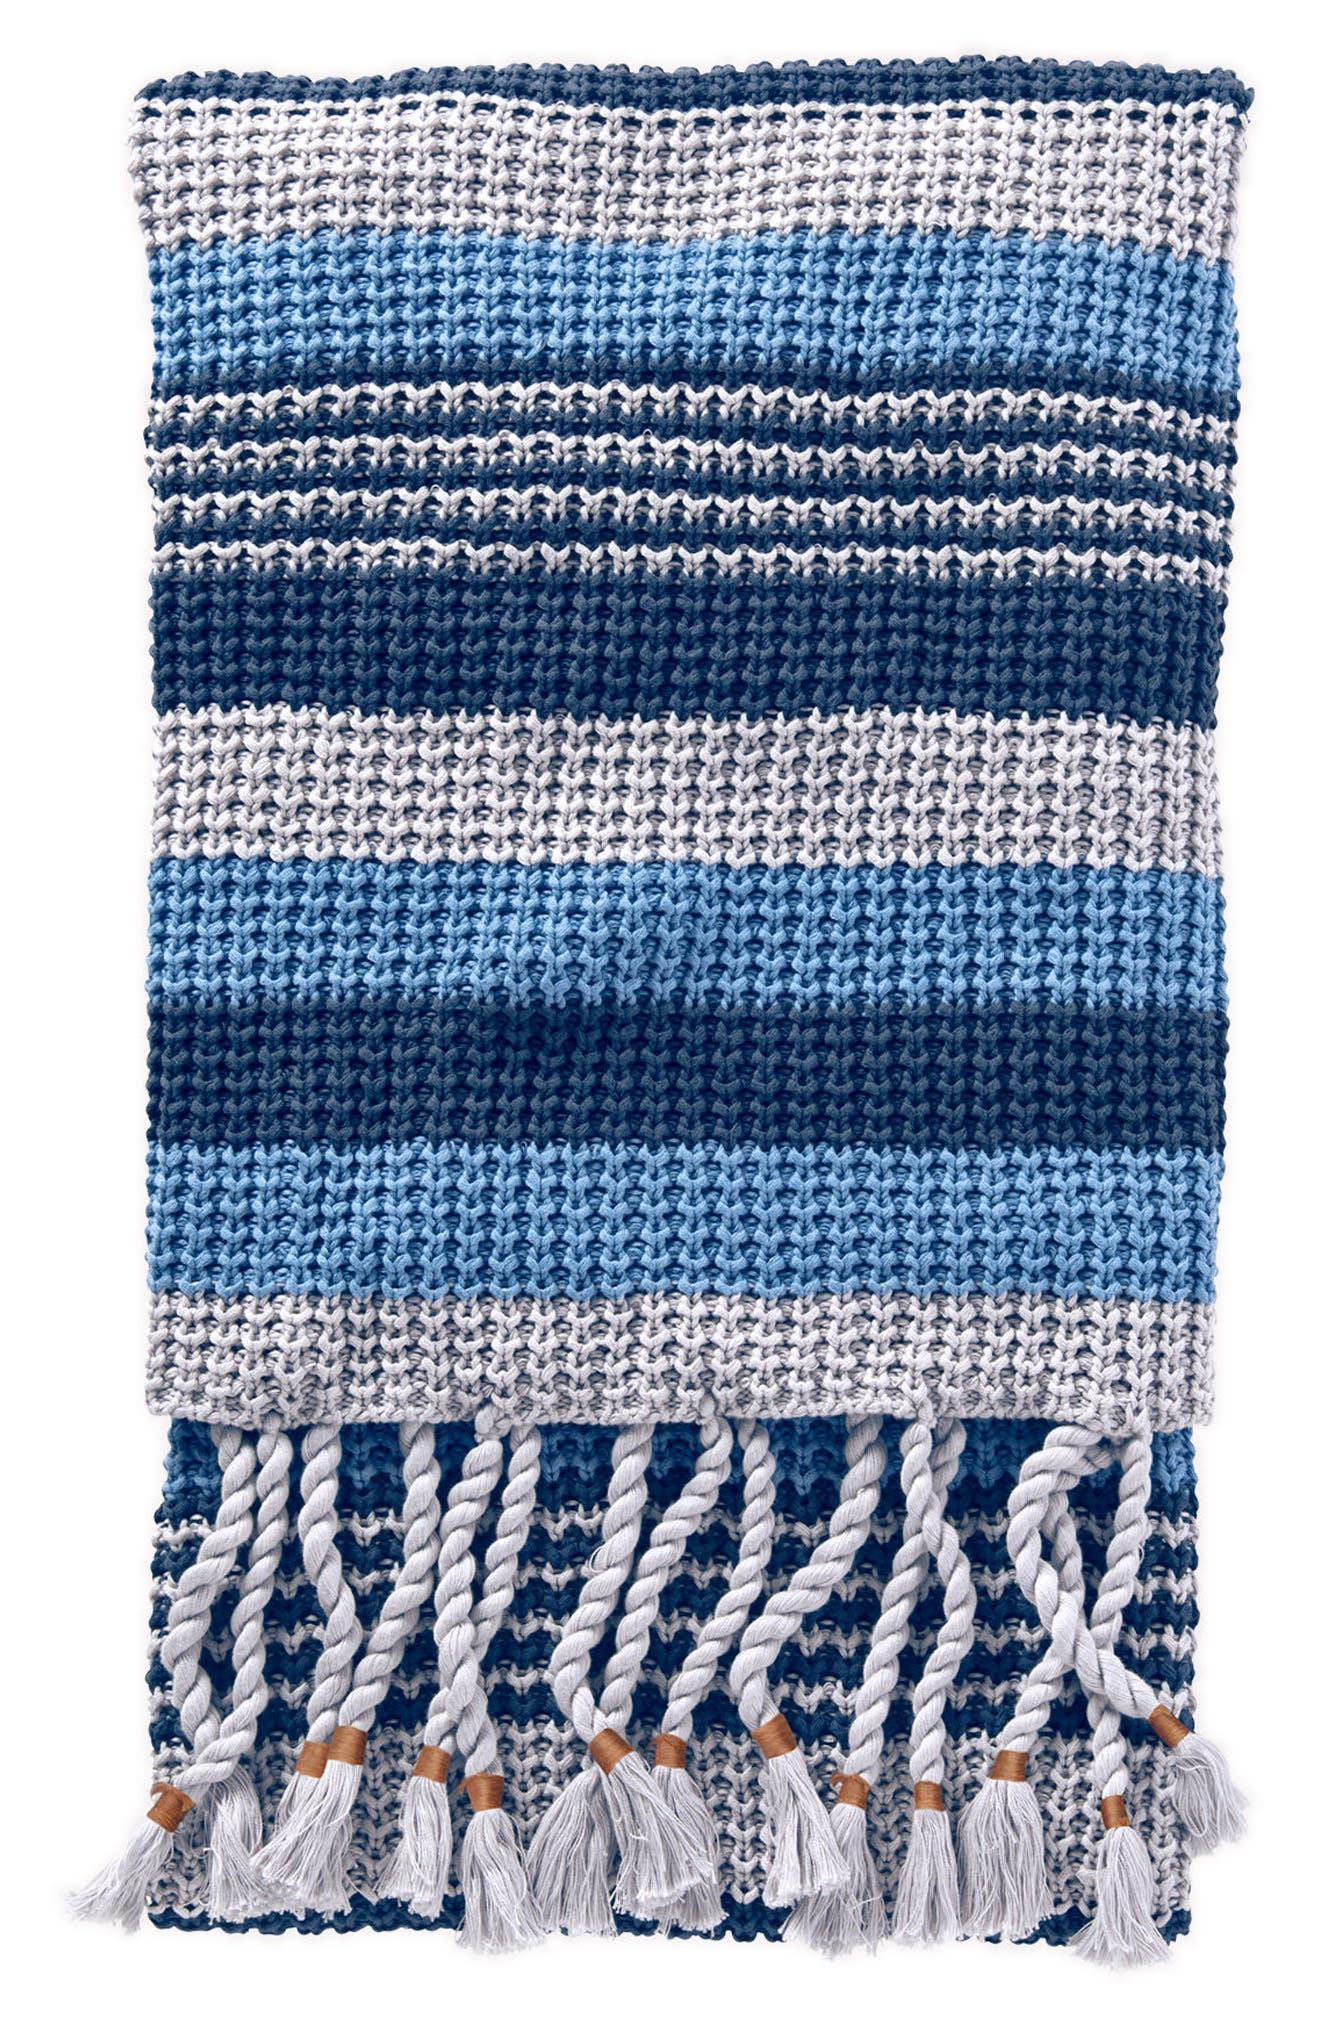 Horizon Stripe Knit Throw,                             Main thumbnail 1, color,                             Blue Multi